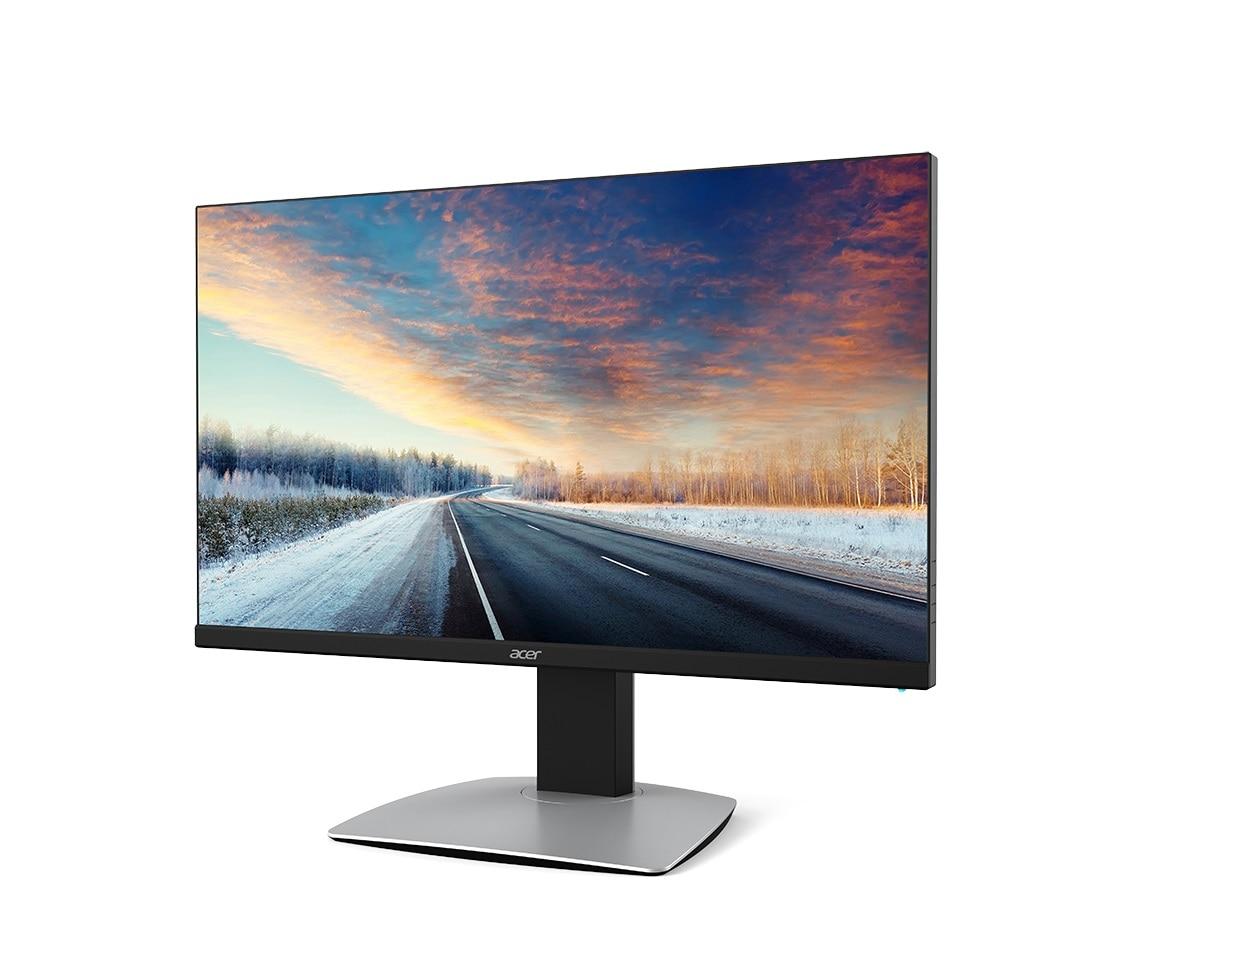 acer bm320 monitor cornici sottili